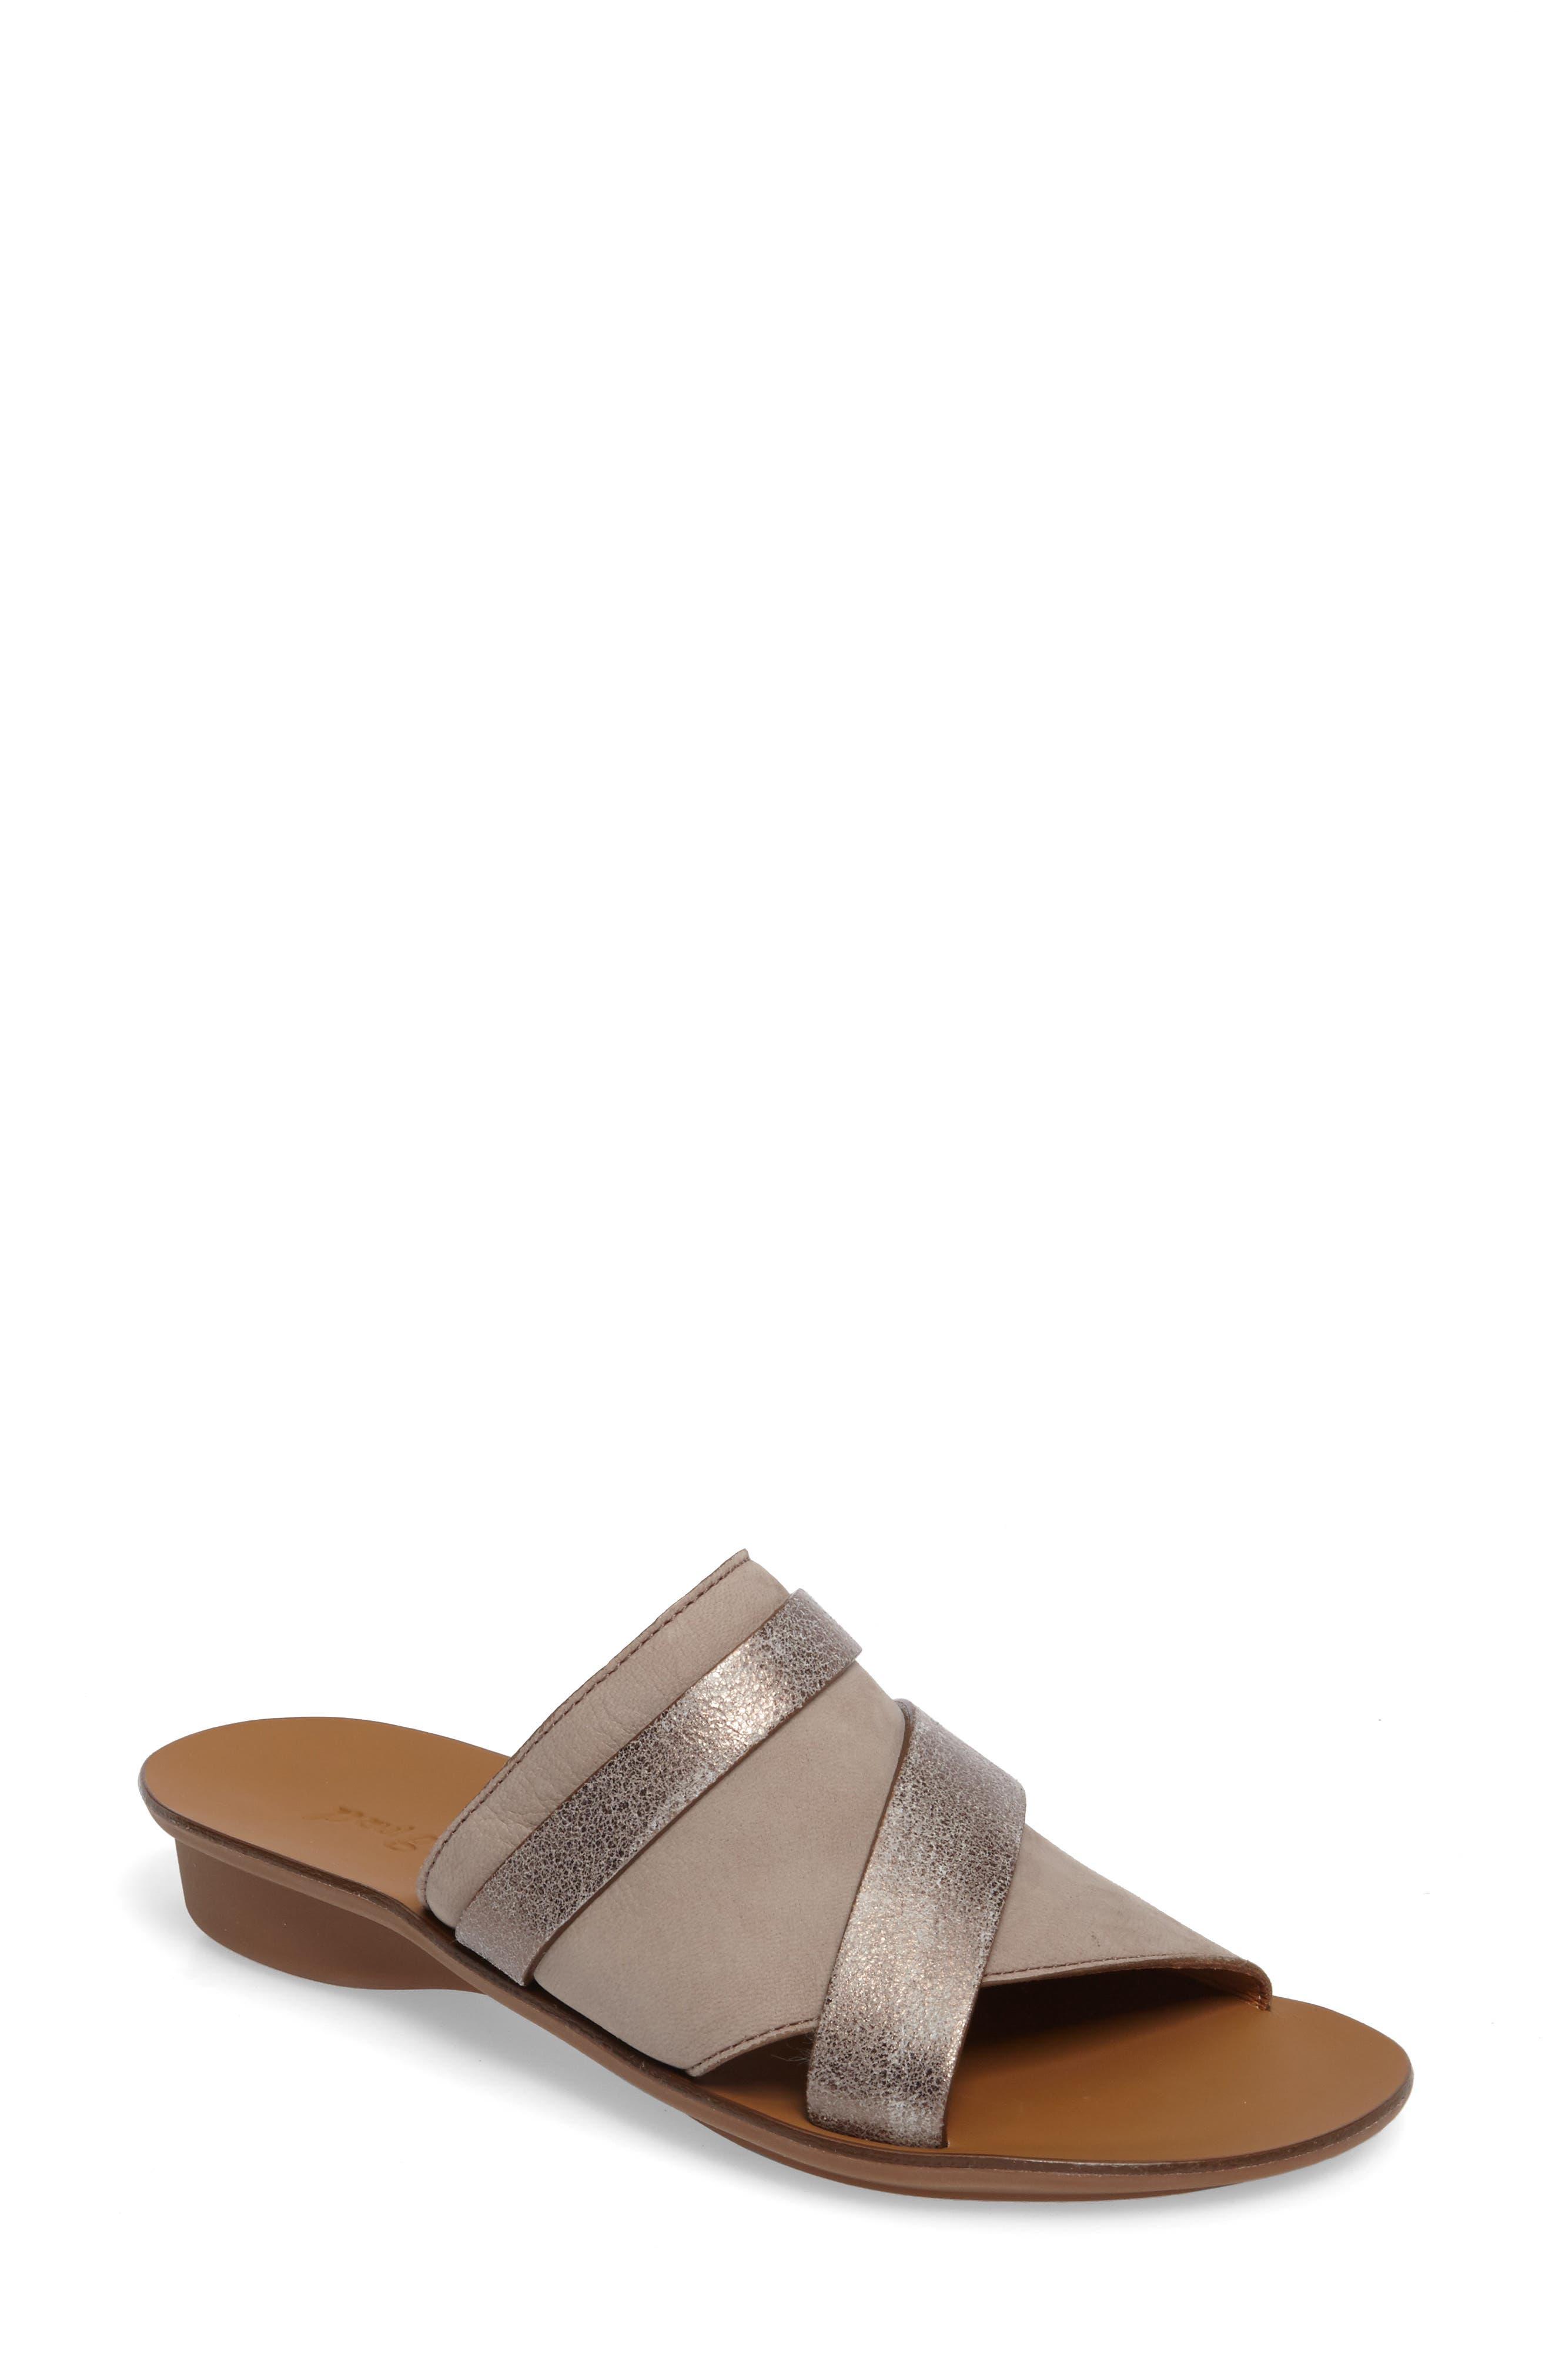 'Bayside' Leather Sandal,                             Main thumbnail 1, color,                             GREY